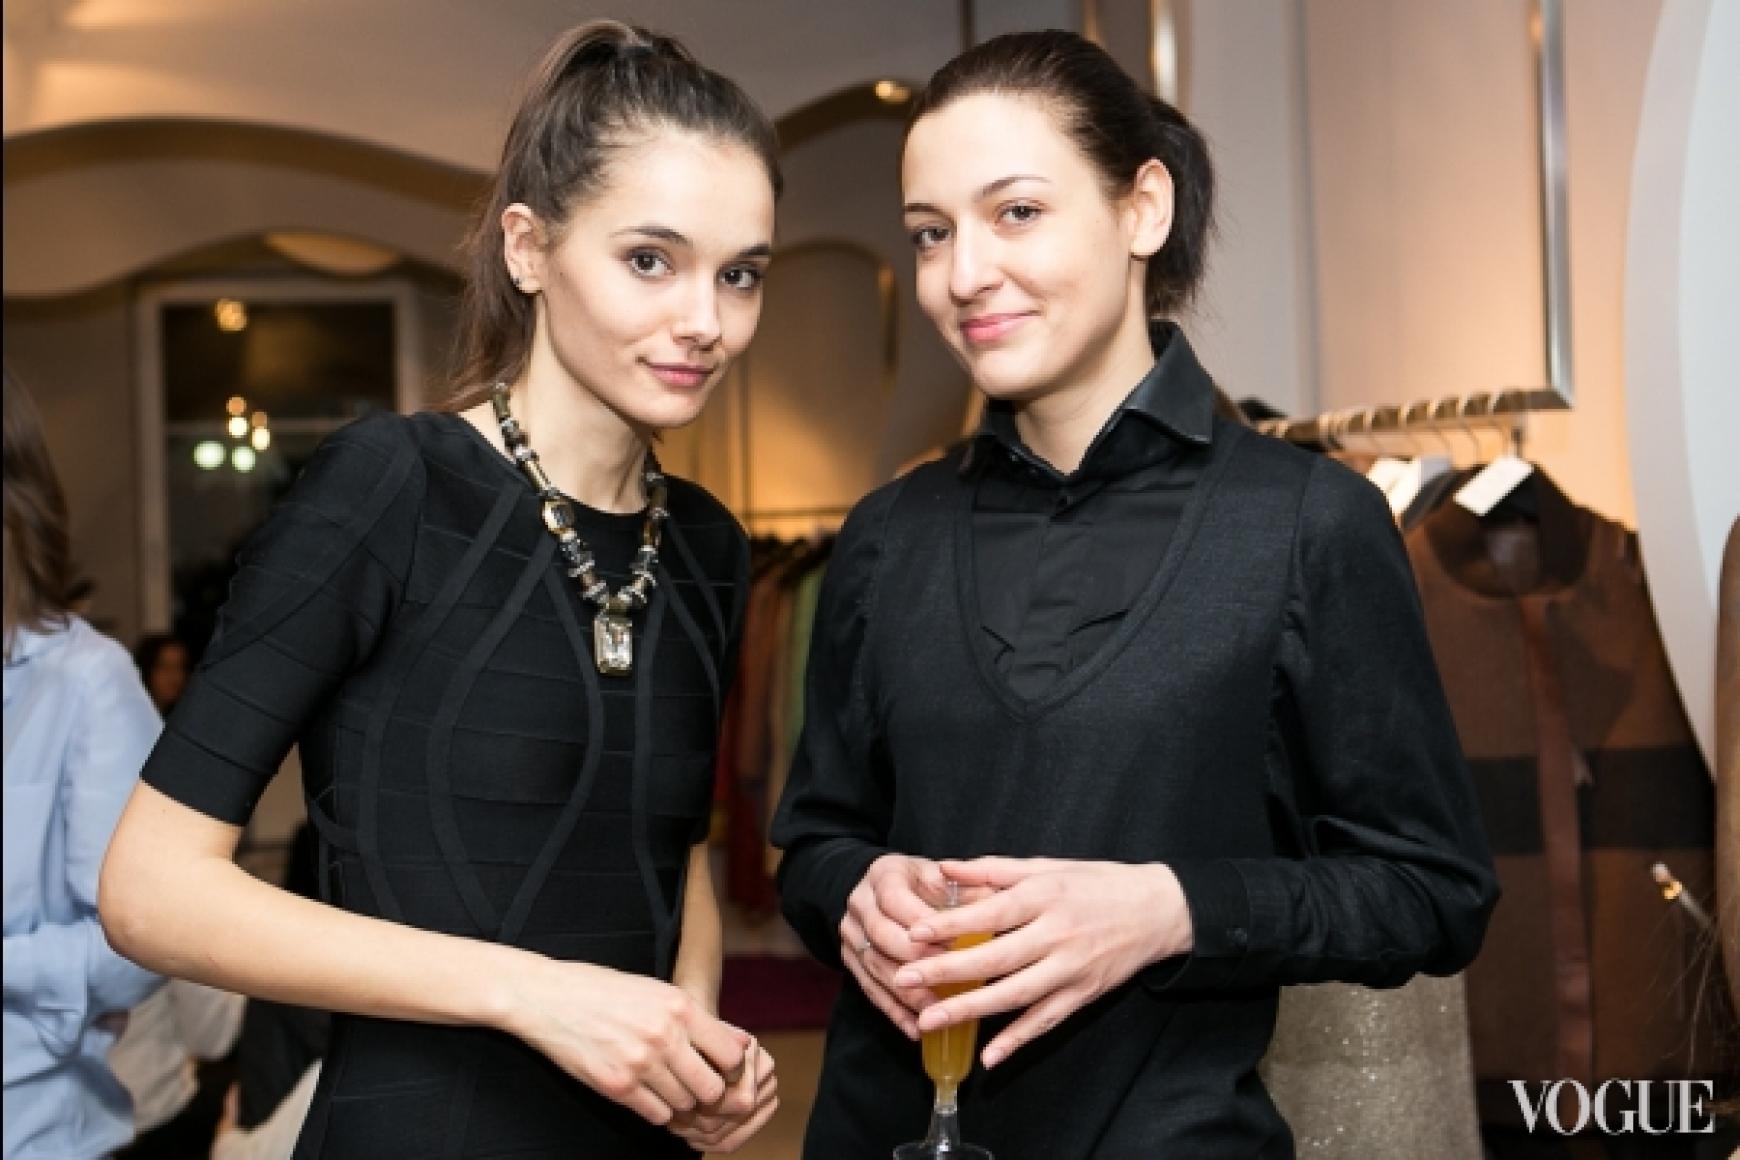 Катерина Федоренко и Даша Заривная